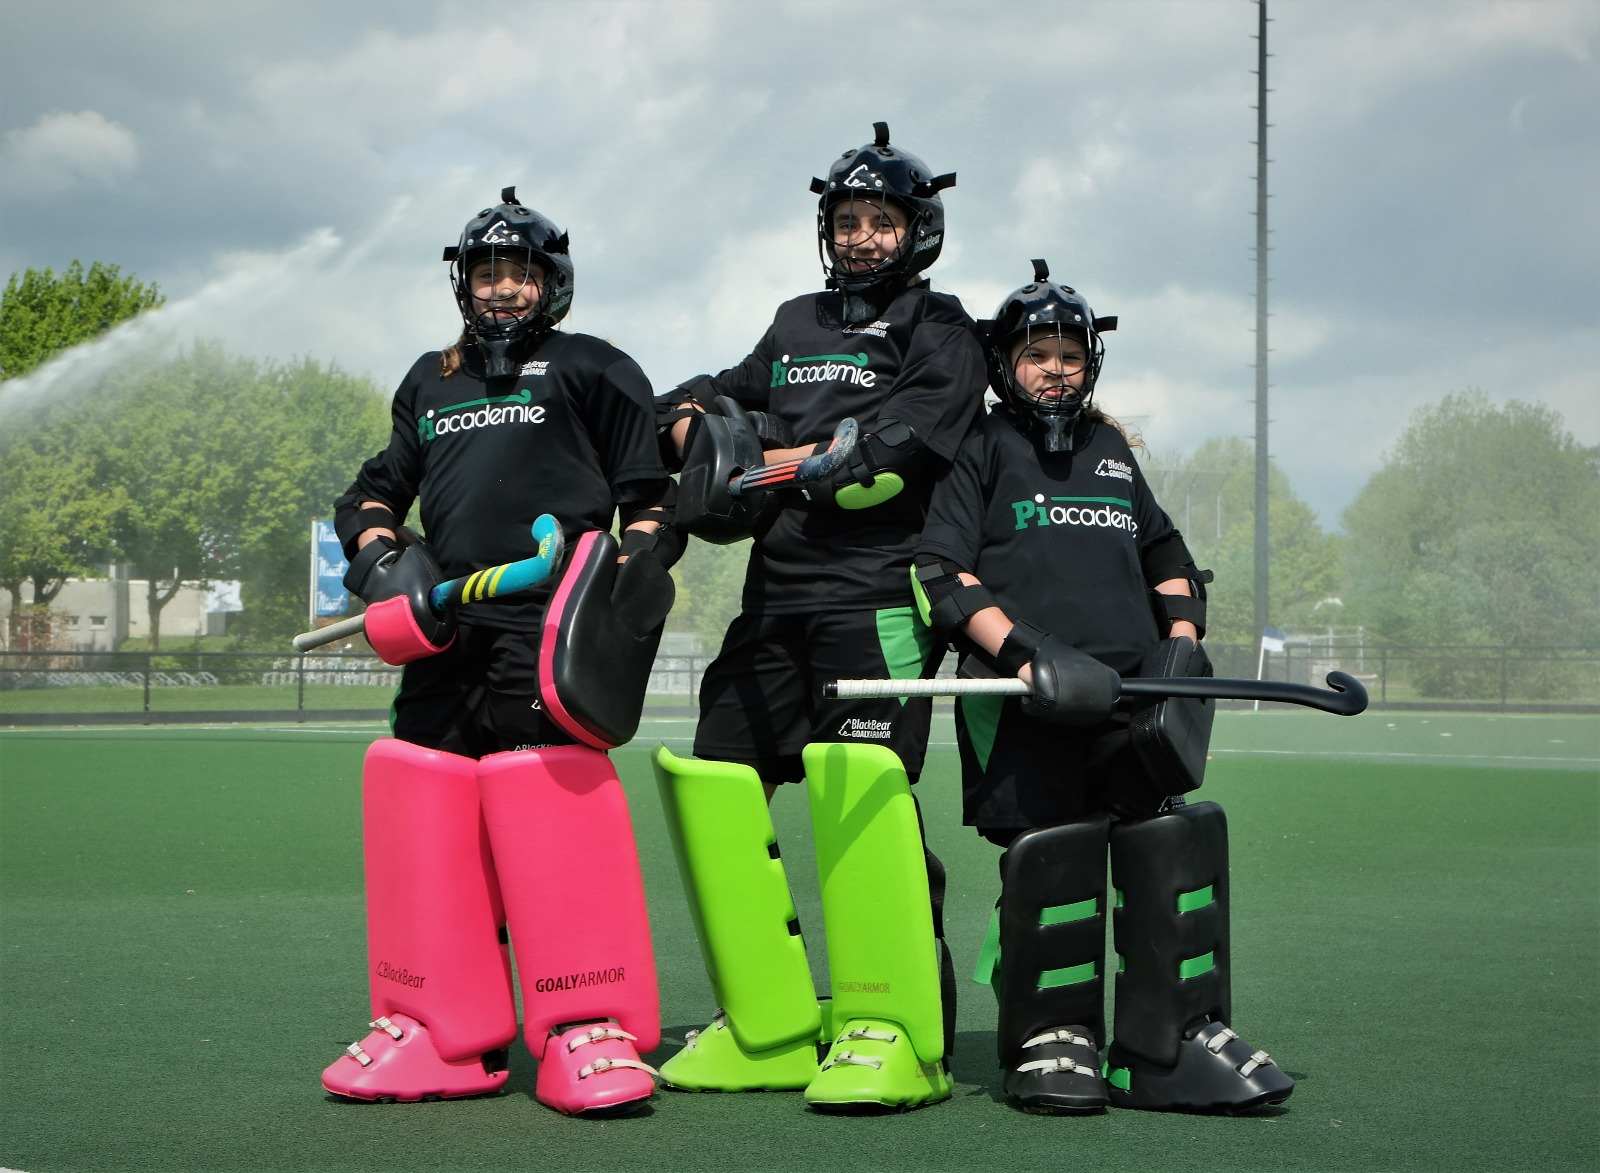 Hockeykleding in India produceren